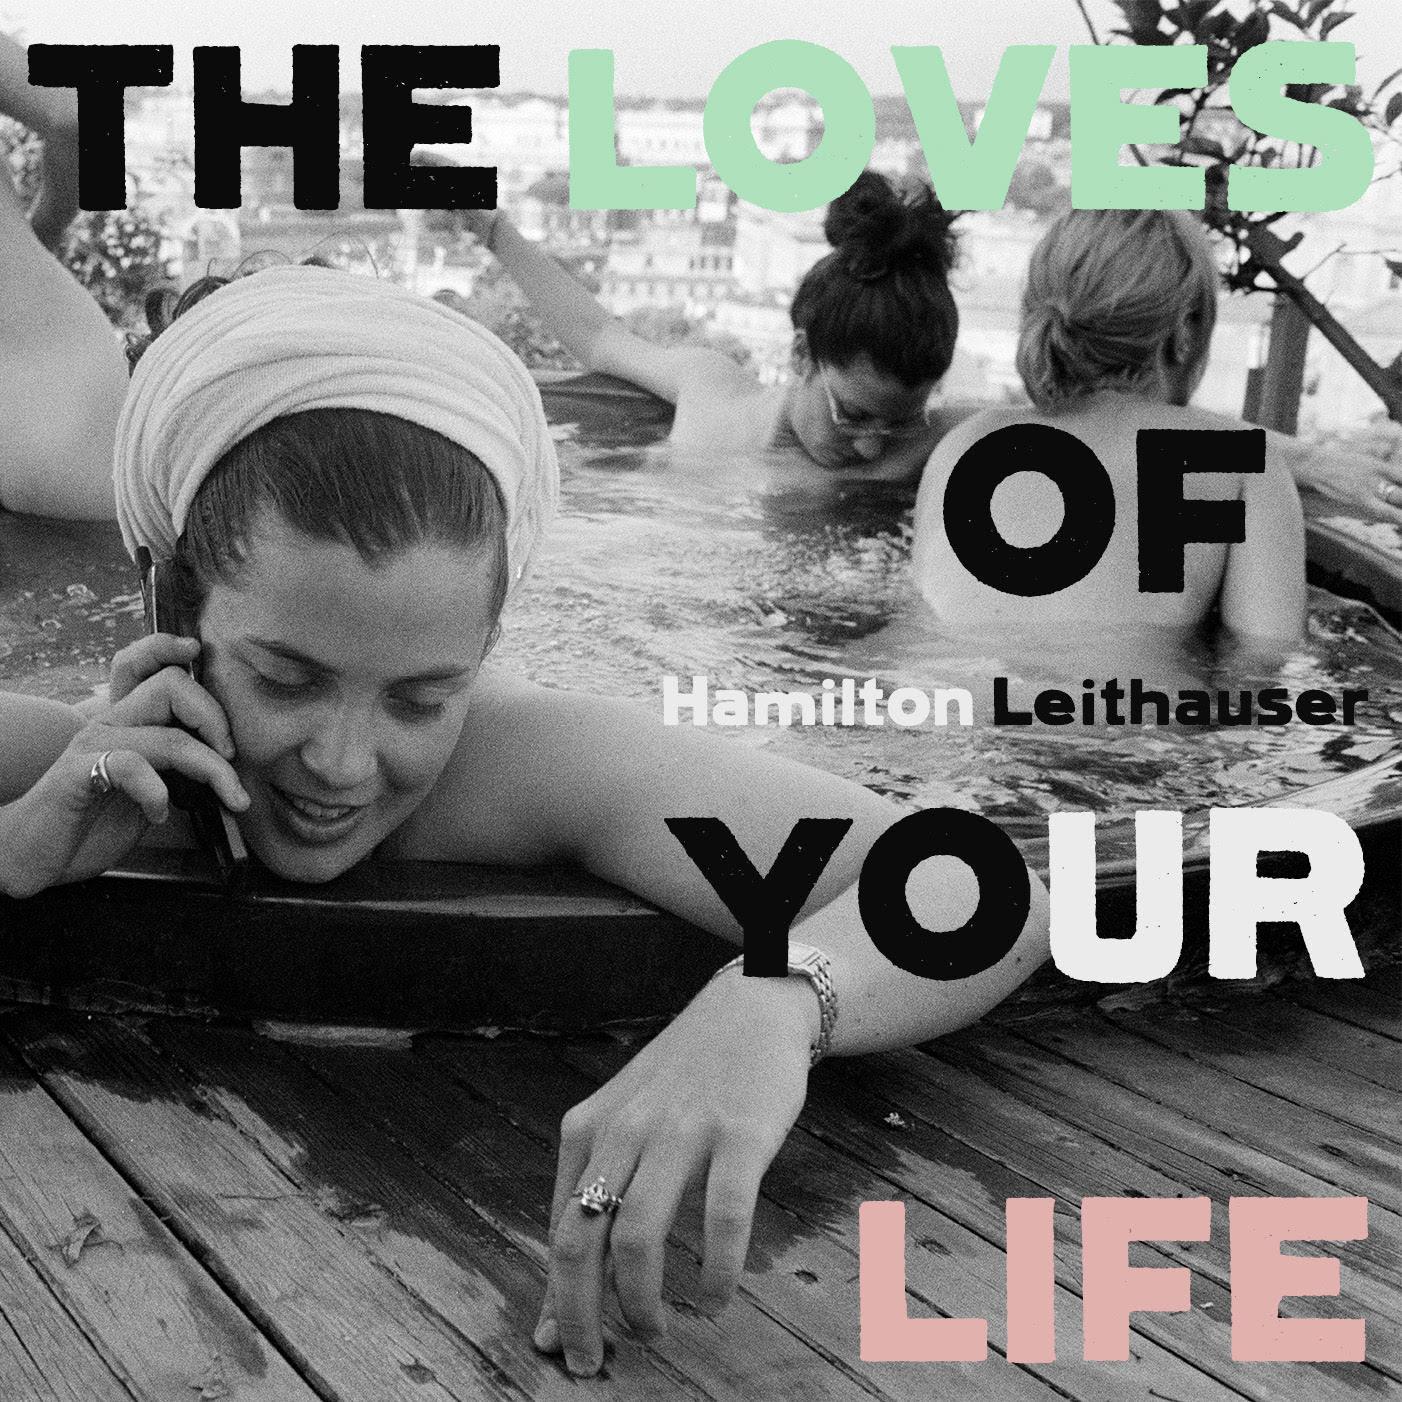 hamilton leithauser the loves of your life album cover artwork